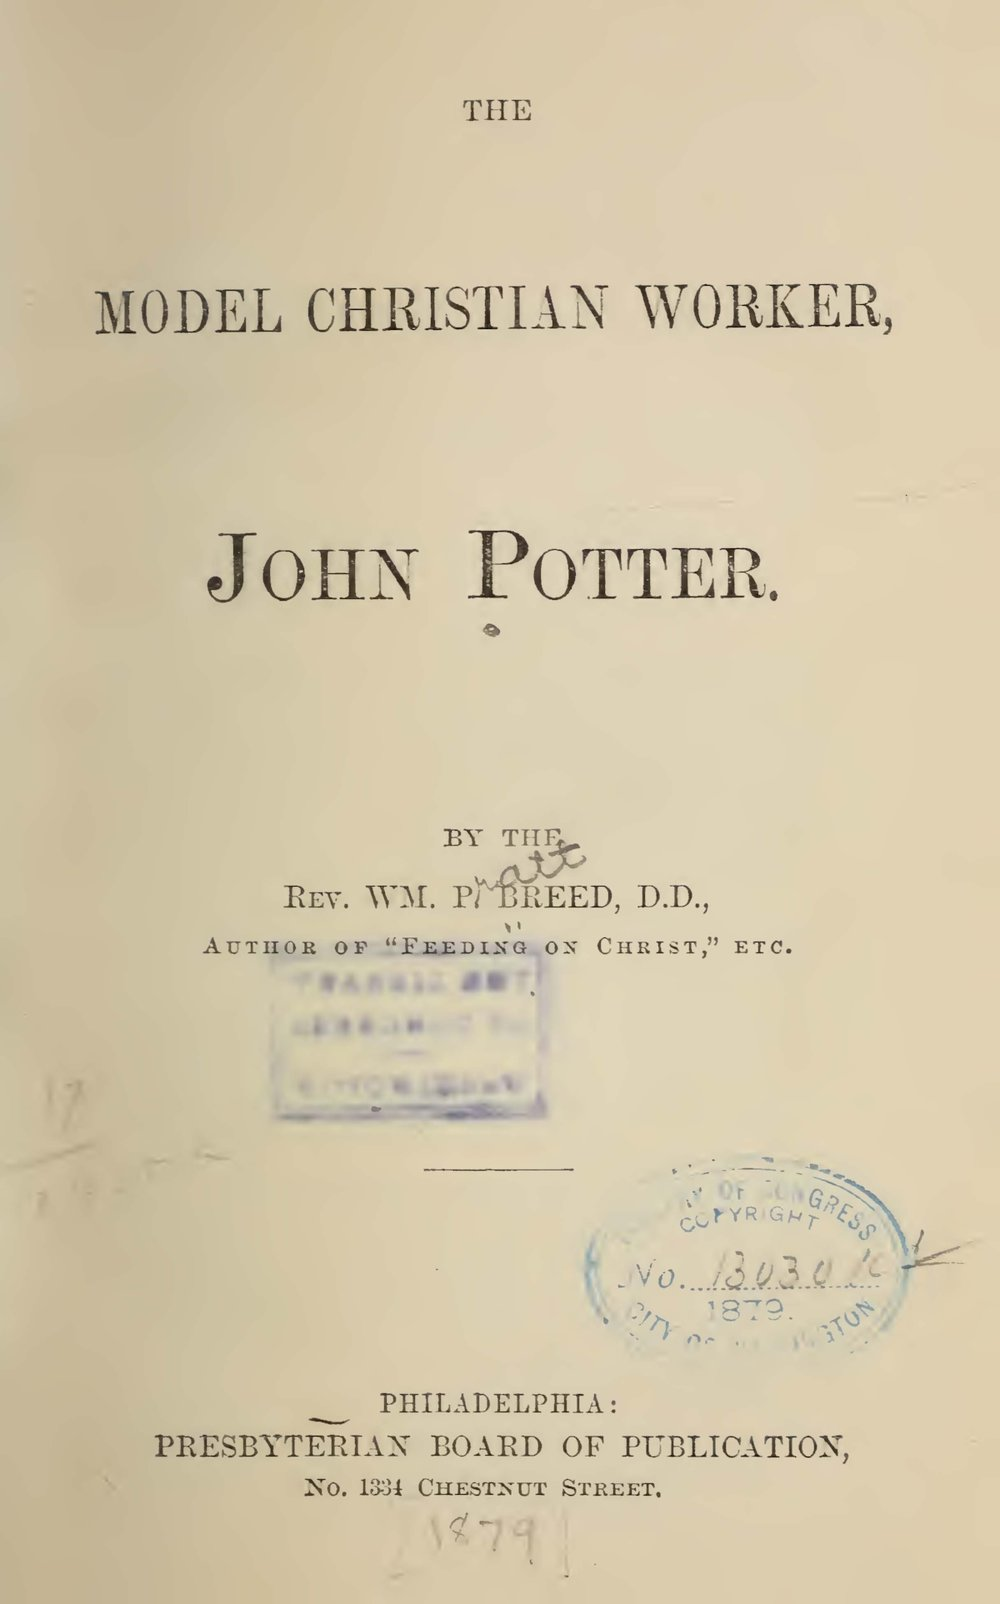 Breed, William Pratt, The Model Christian Worker Title Page.jpg